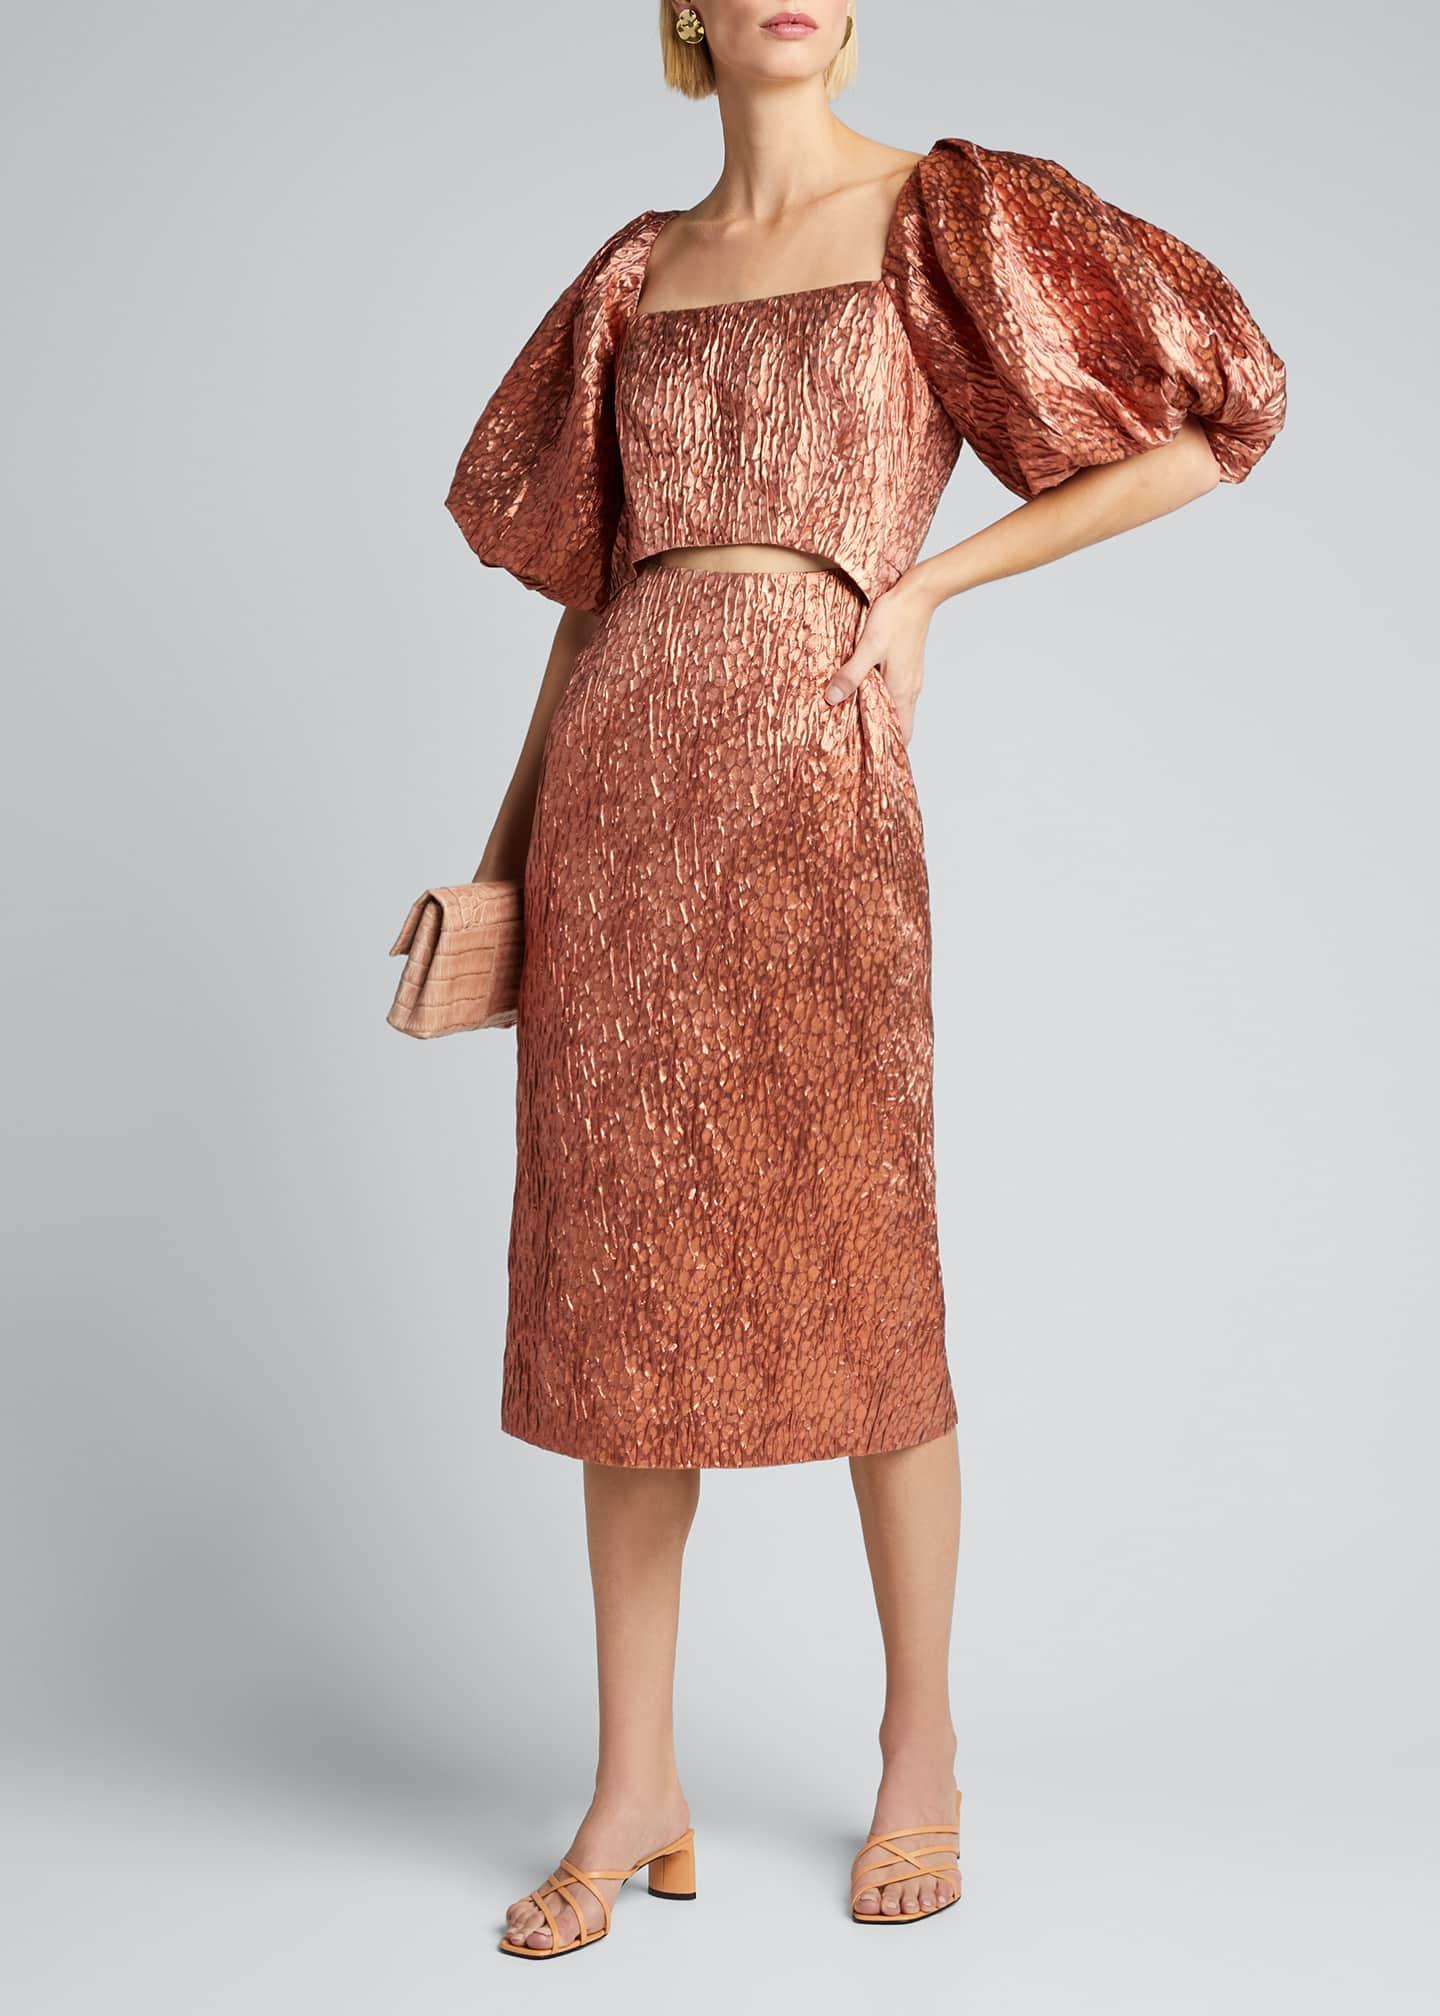 Rachel Comey Limbara Puff-Sleeve Cutout Cocktail Dress